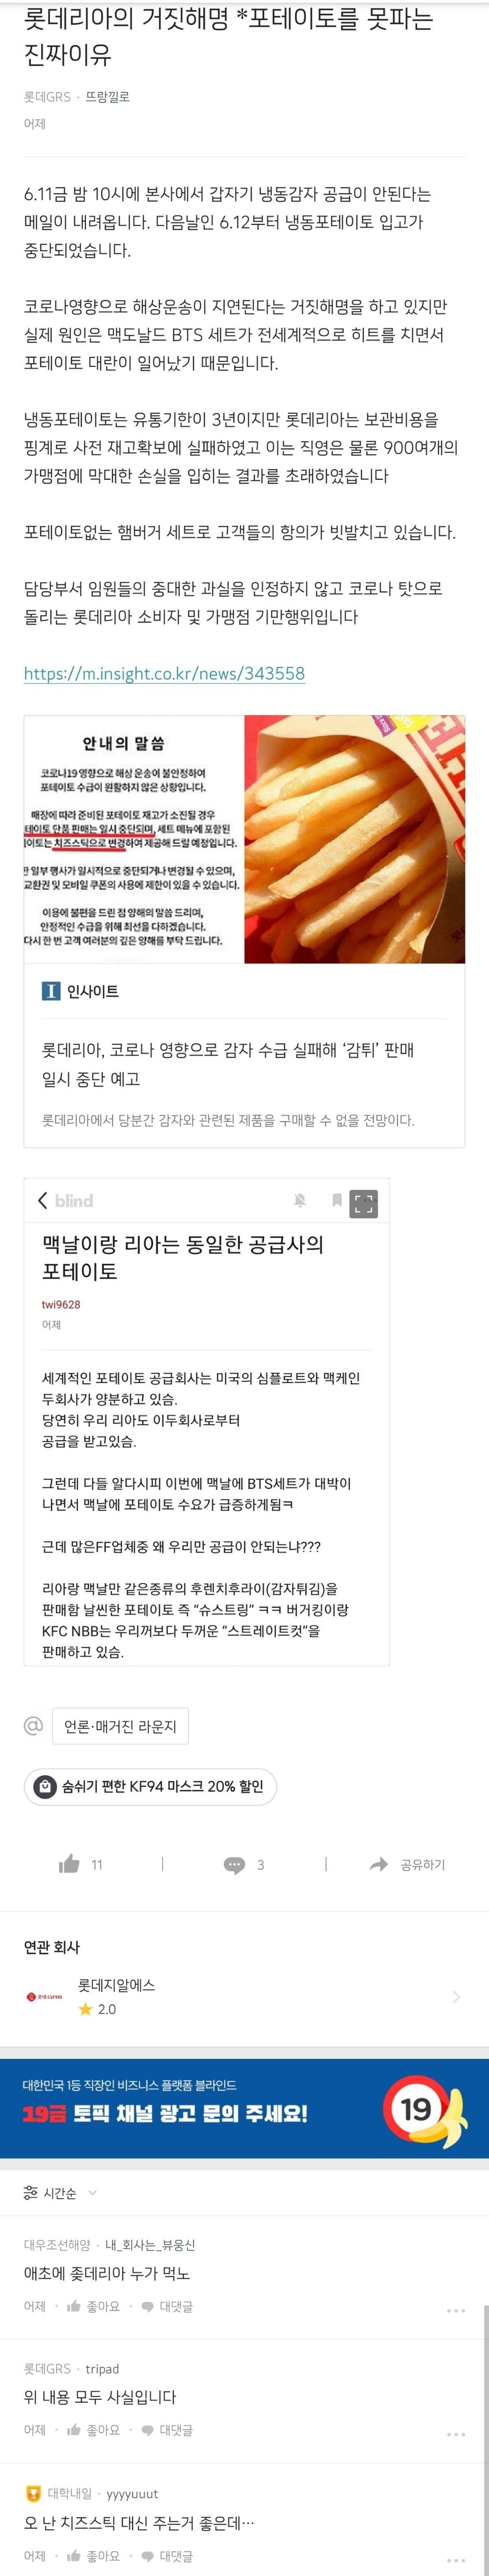 Screenshot_20210615-100421_blind.jpg 지금 롯데리아 감자튀김이 품귀현상인 이유 ㄷㄷ